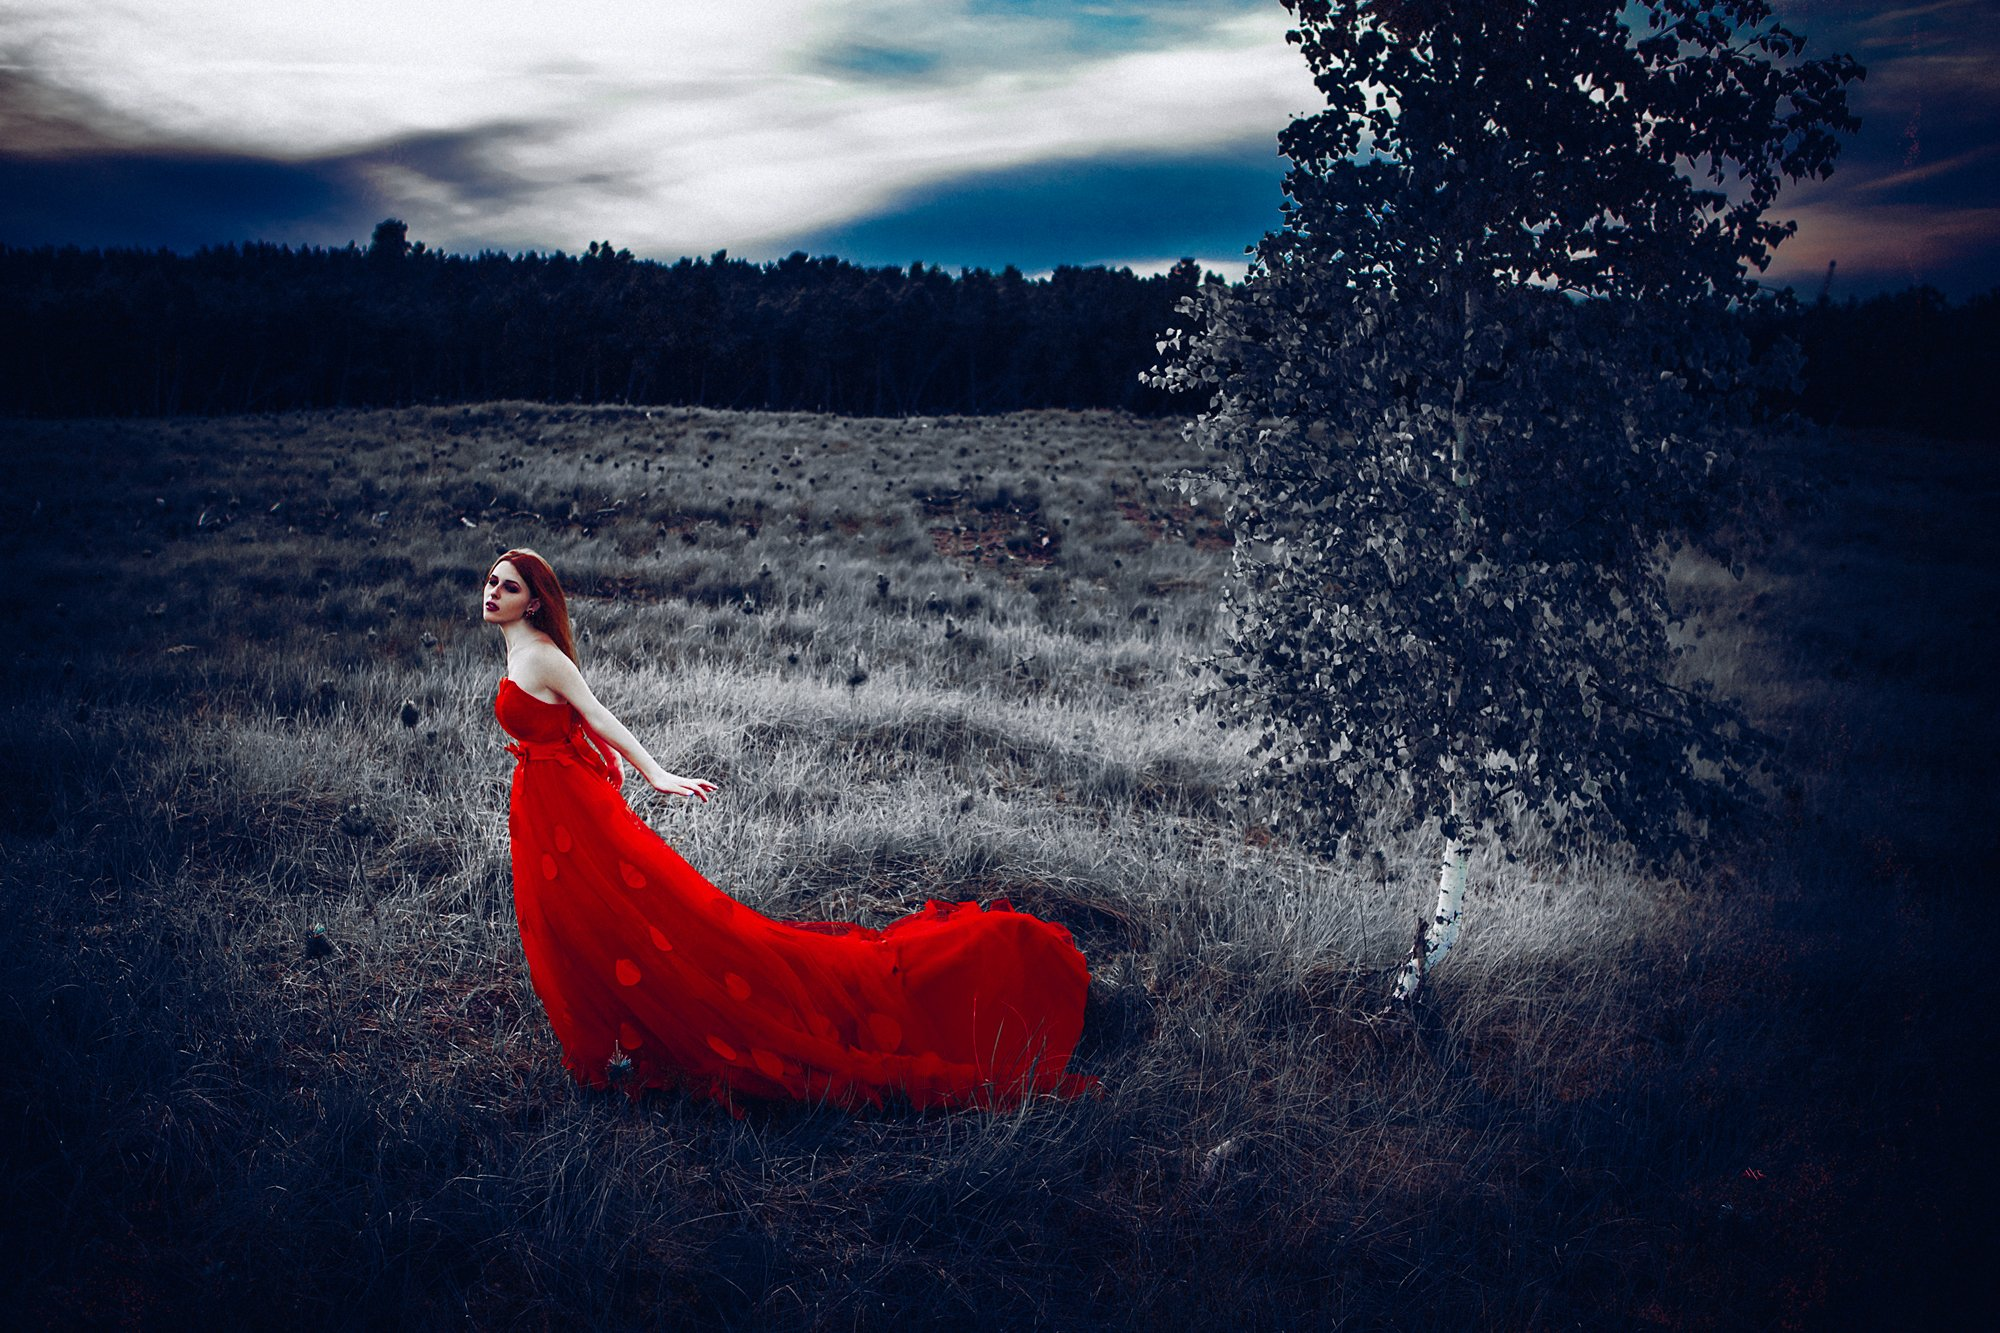 woman, portrait, dress, outdoors, conceptual, Руслан Болгов (Axe)